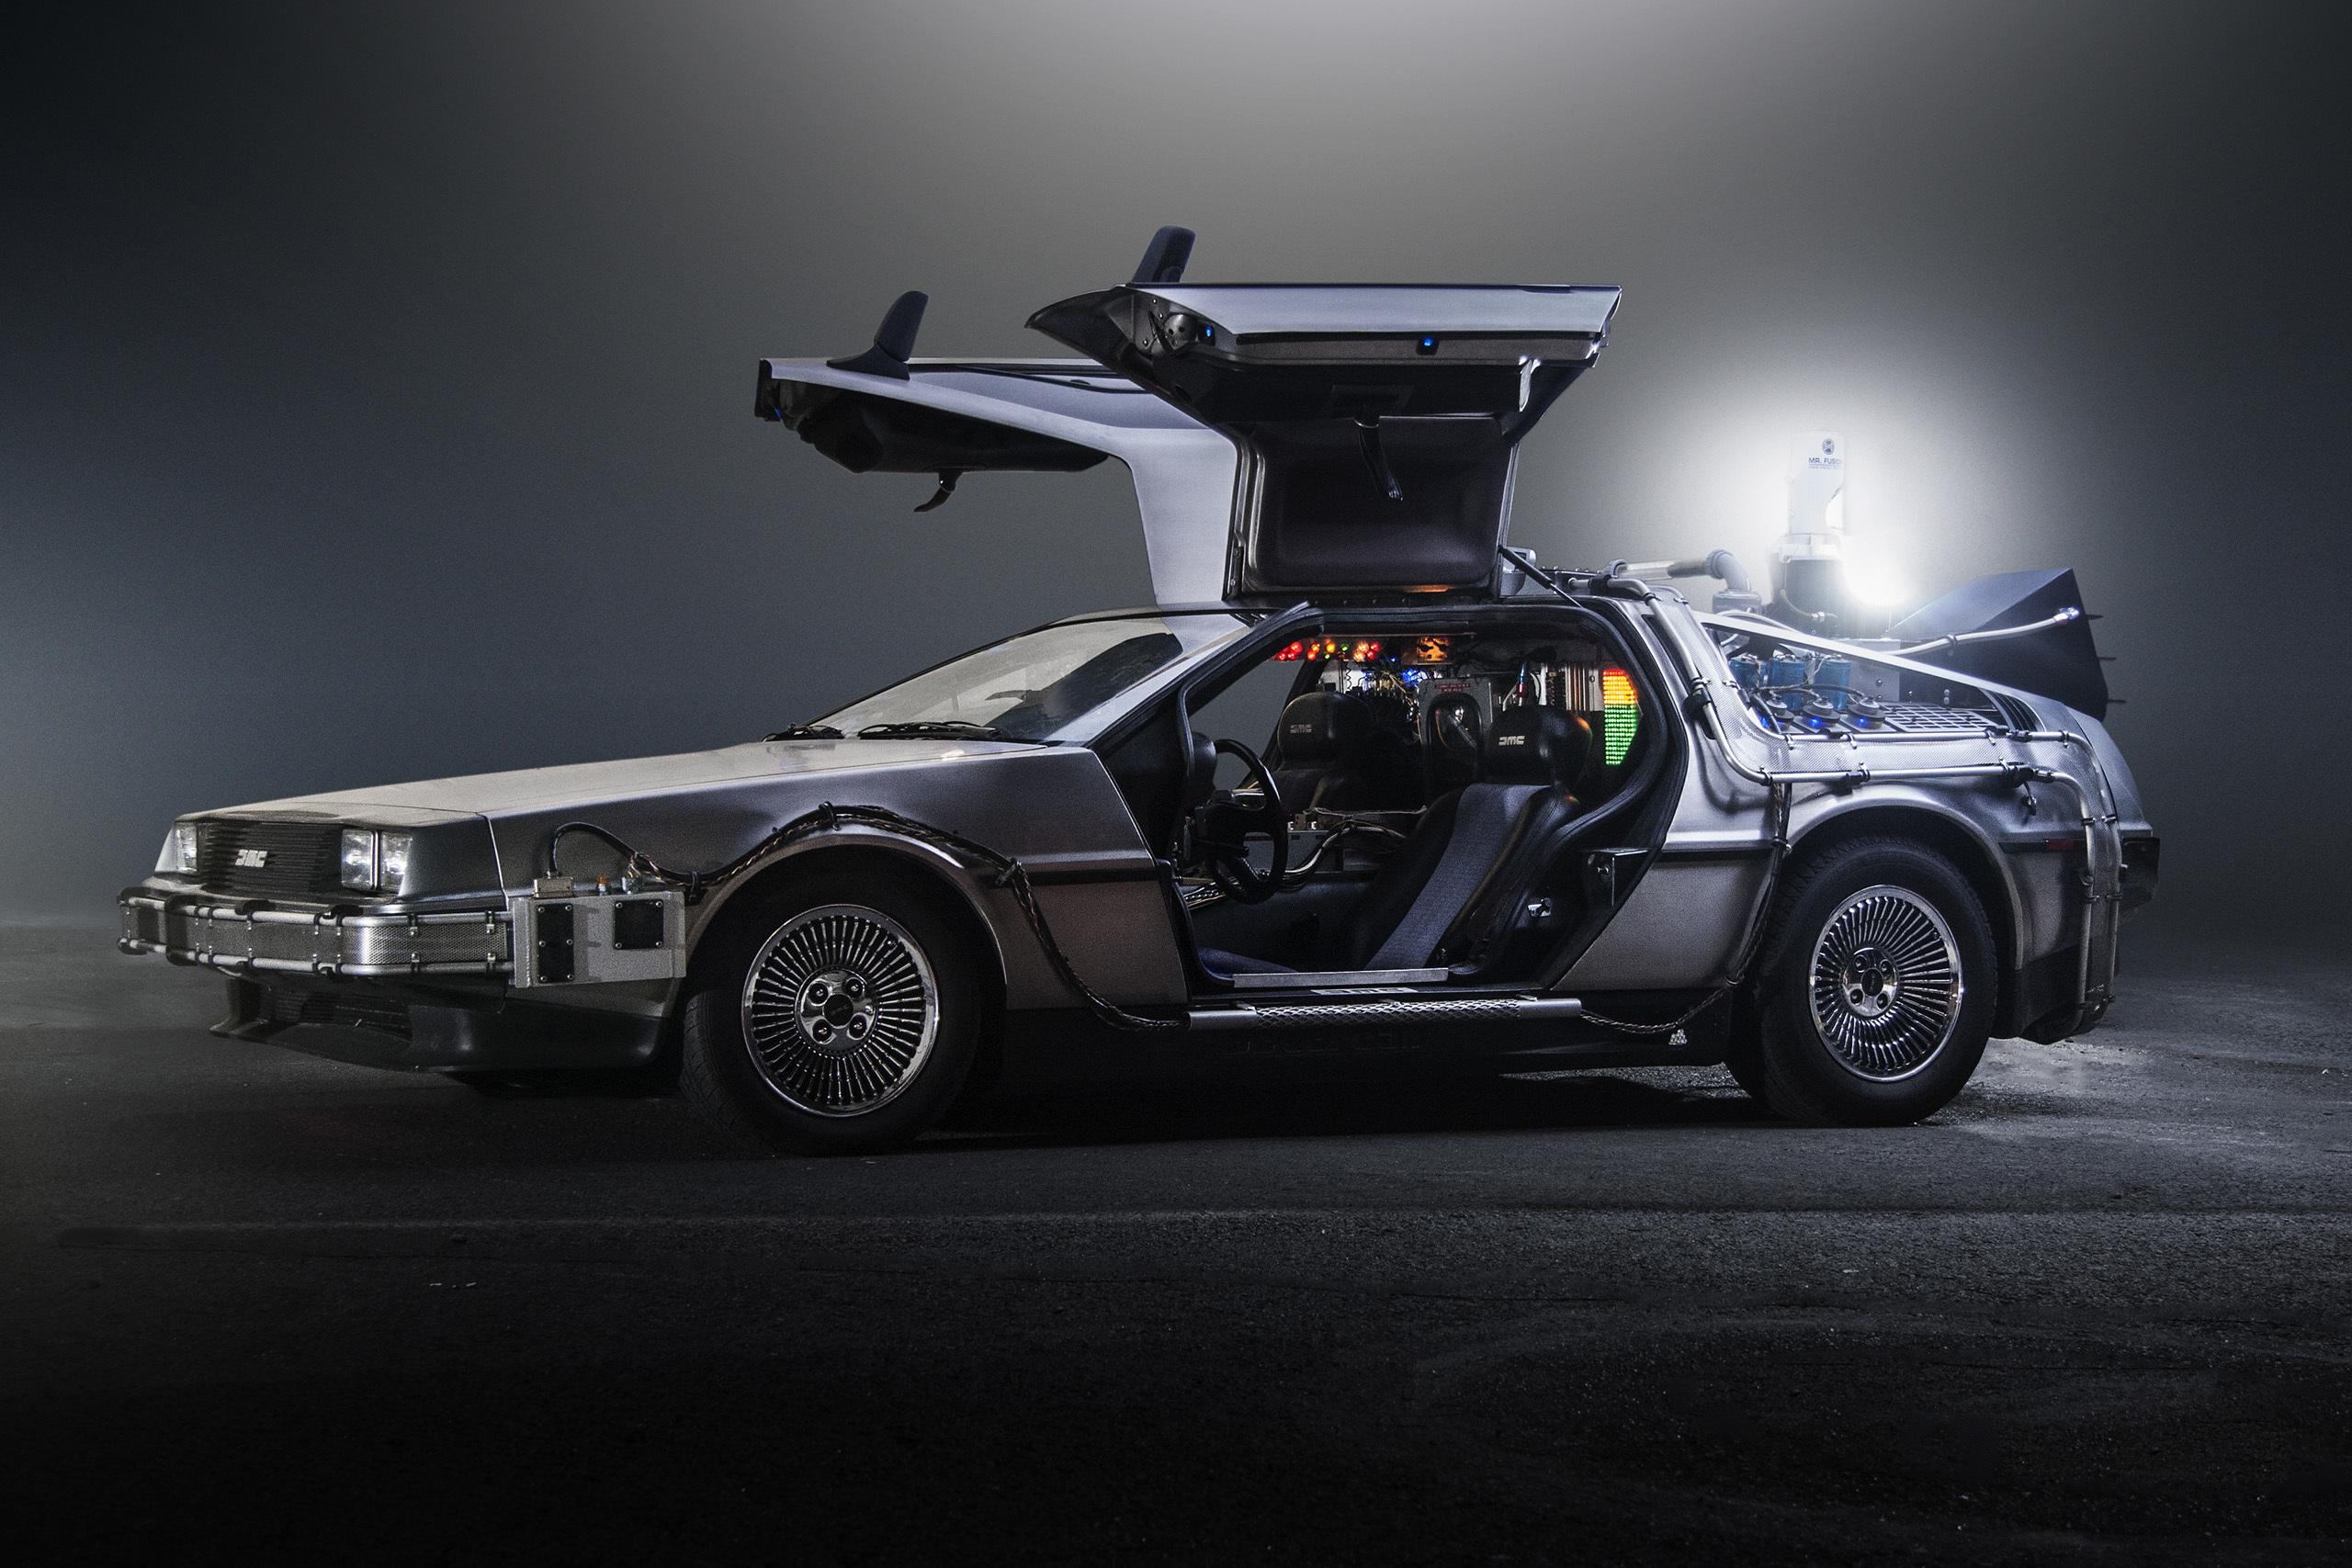 Reserve an all-new DeLorean DMC-12